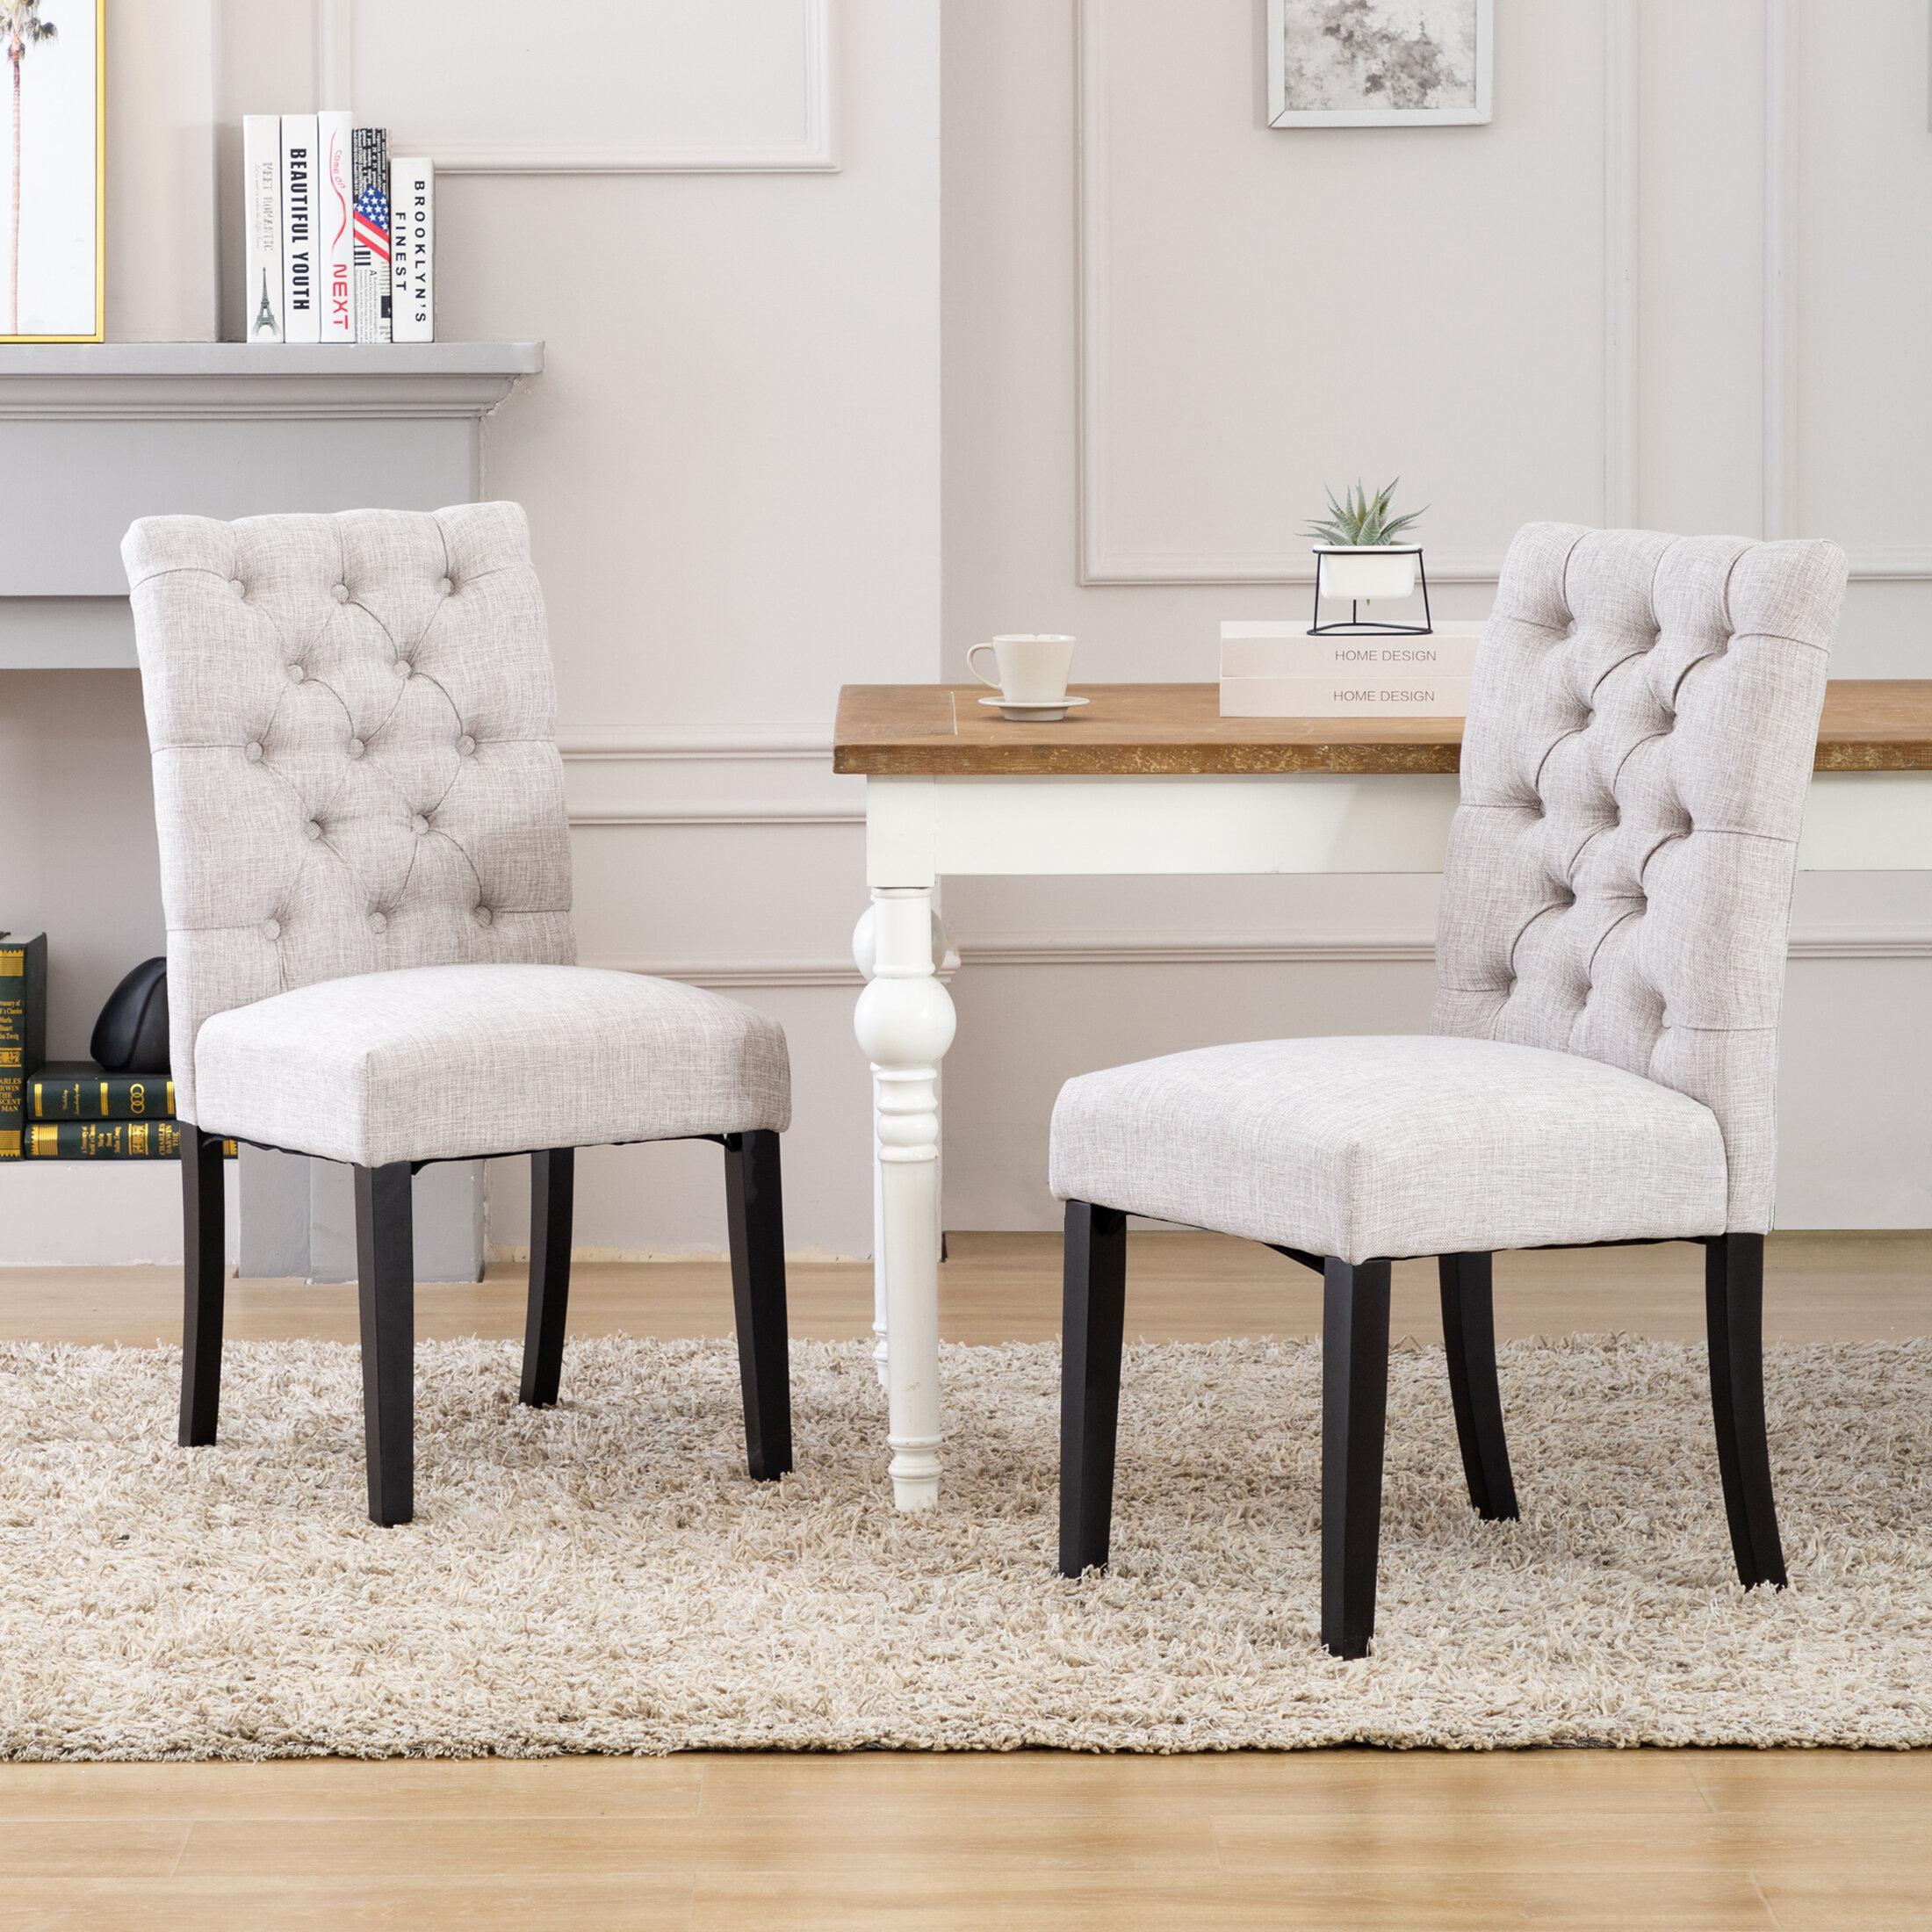 Red Barrel Studio Arahi Tufted Linen Upholstered Parsons Chair Wayfair